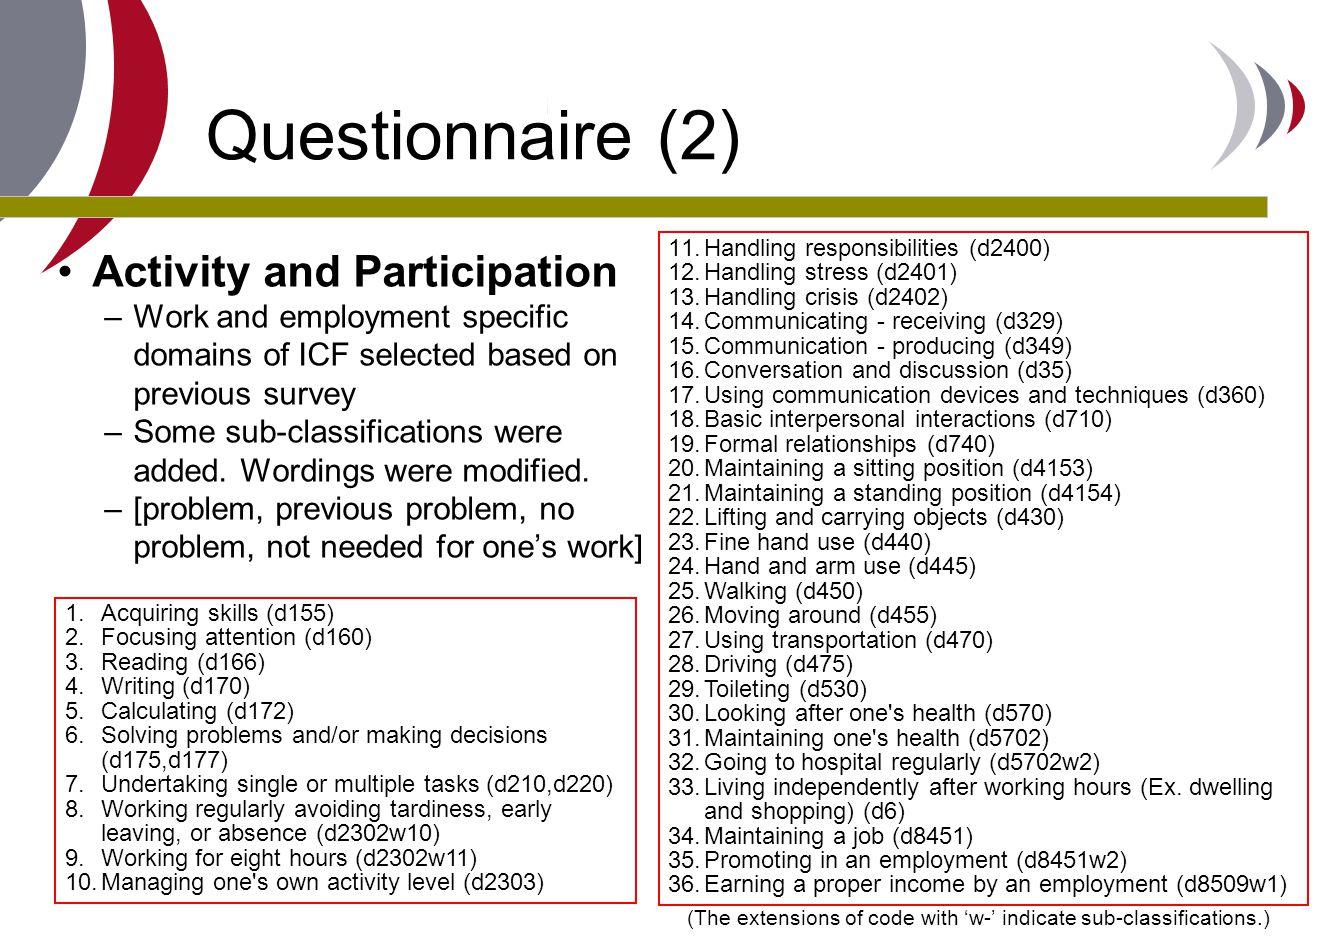 Questionnaire (2) Activity and Participation